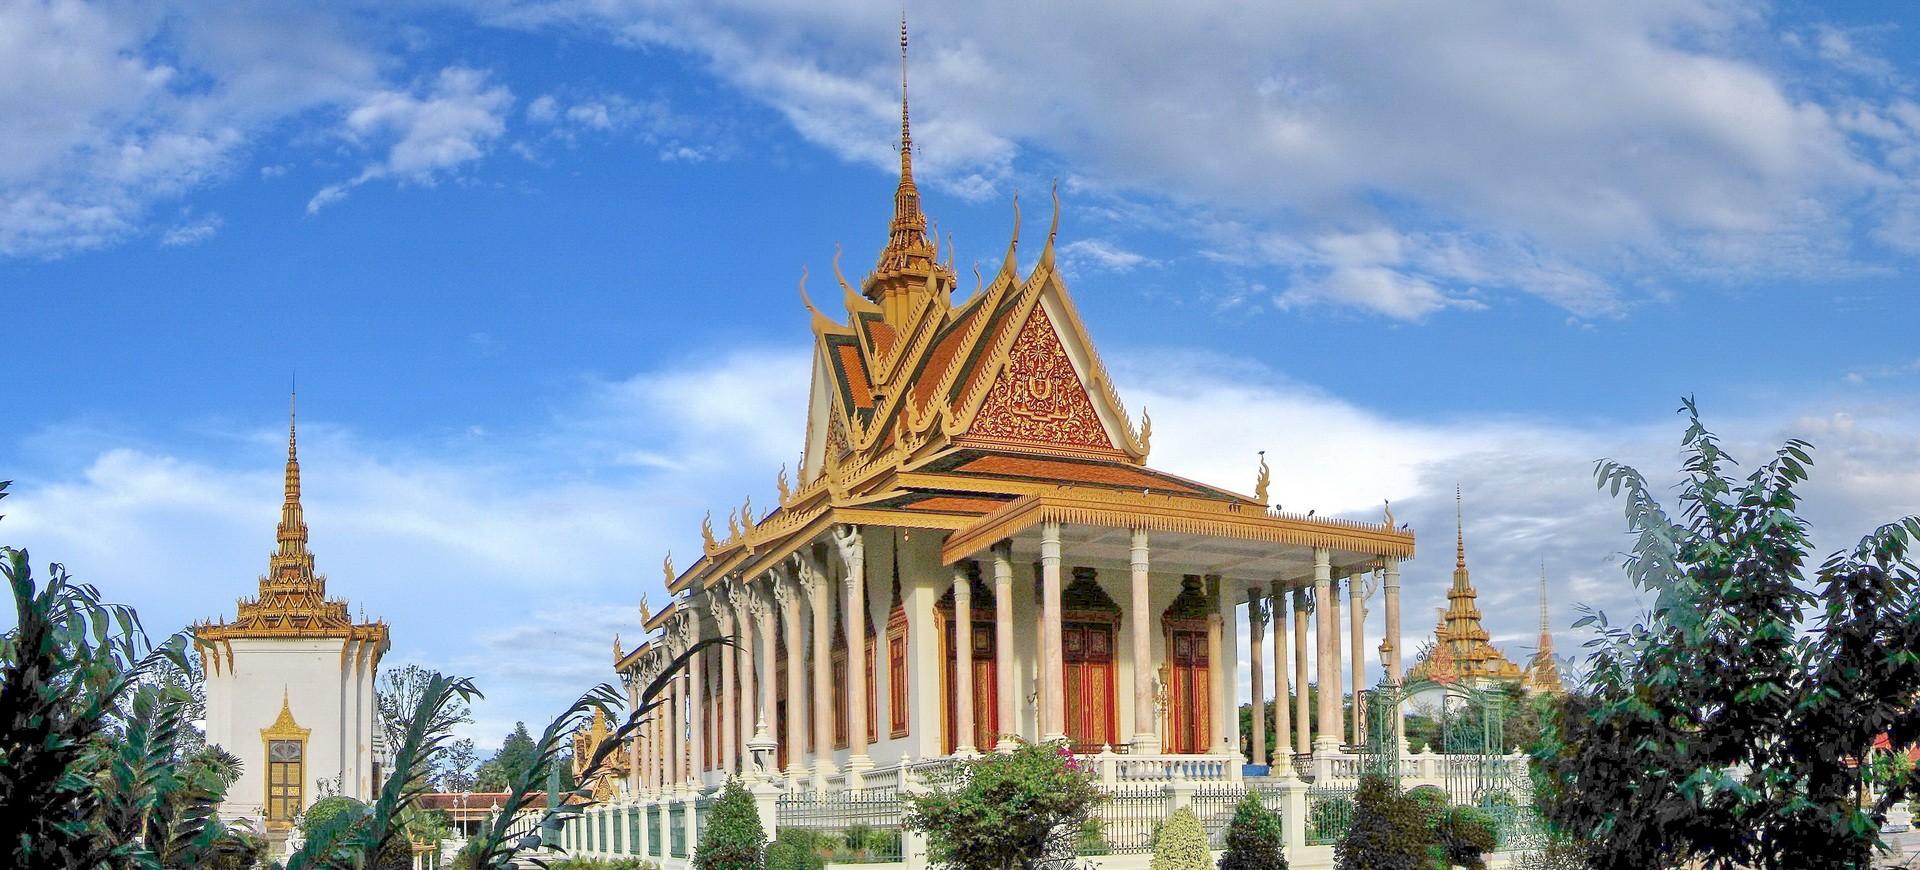 Cambodge Phnom Penh Palais Royal